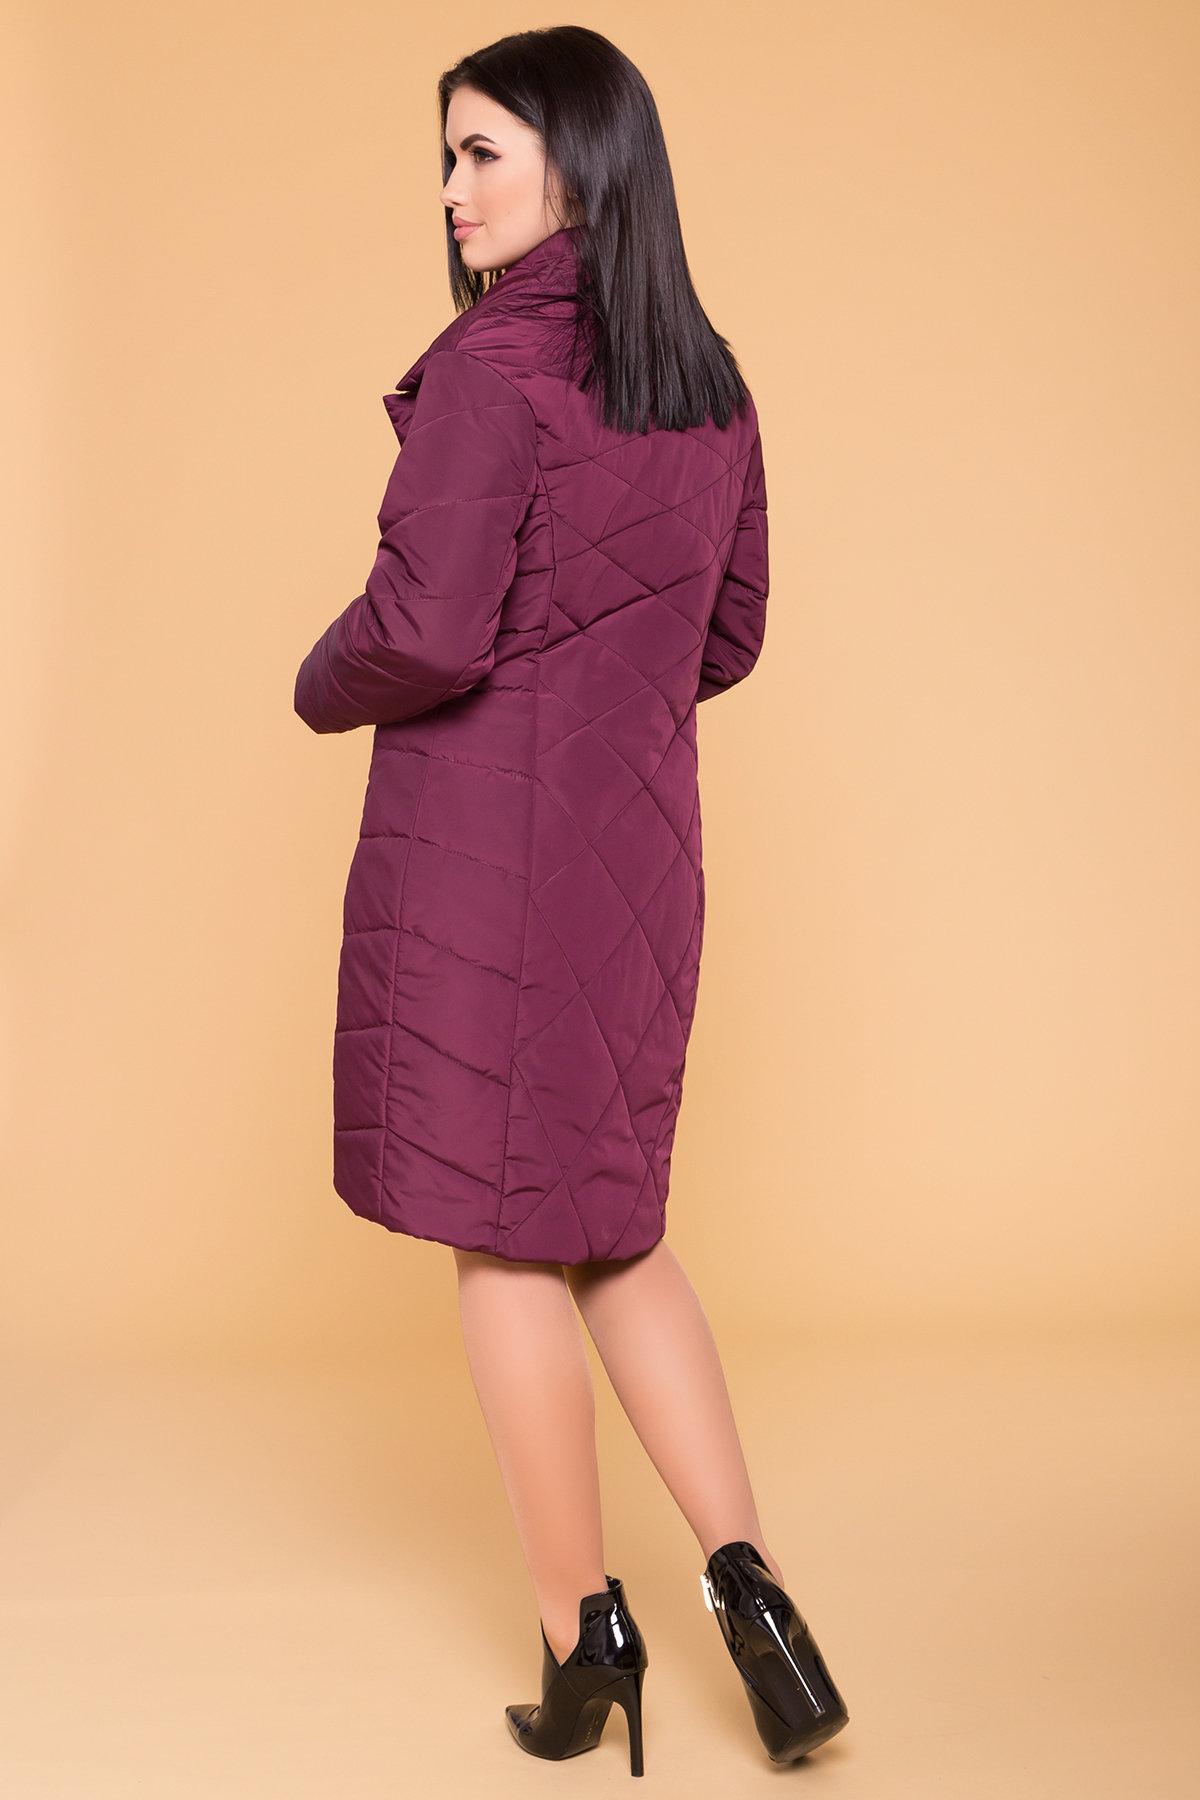 Пальто Сандра 4440 Цвет: Слива